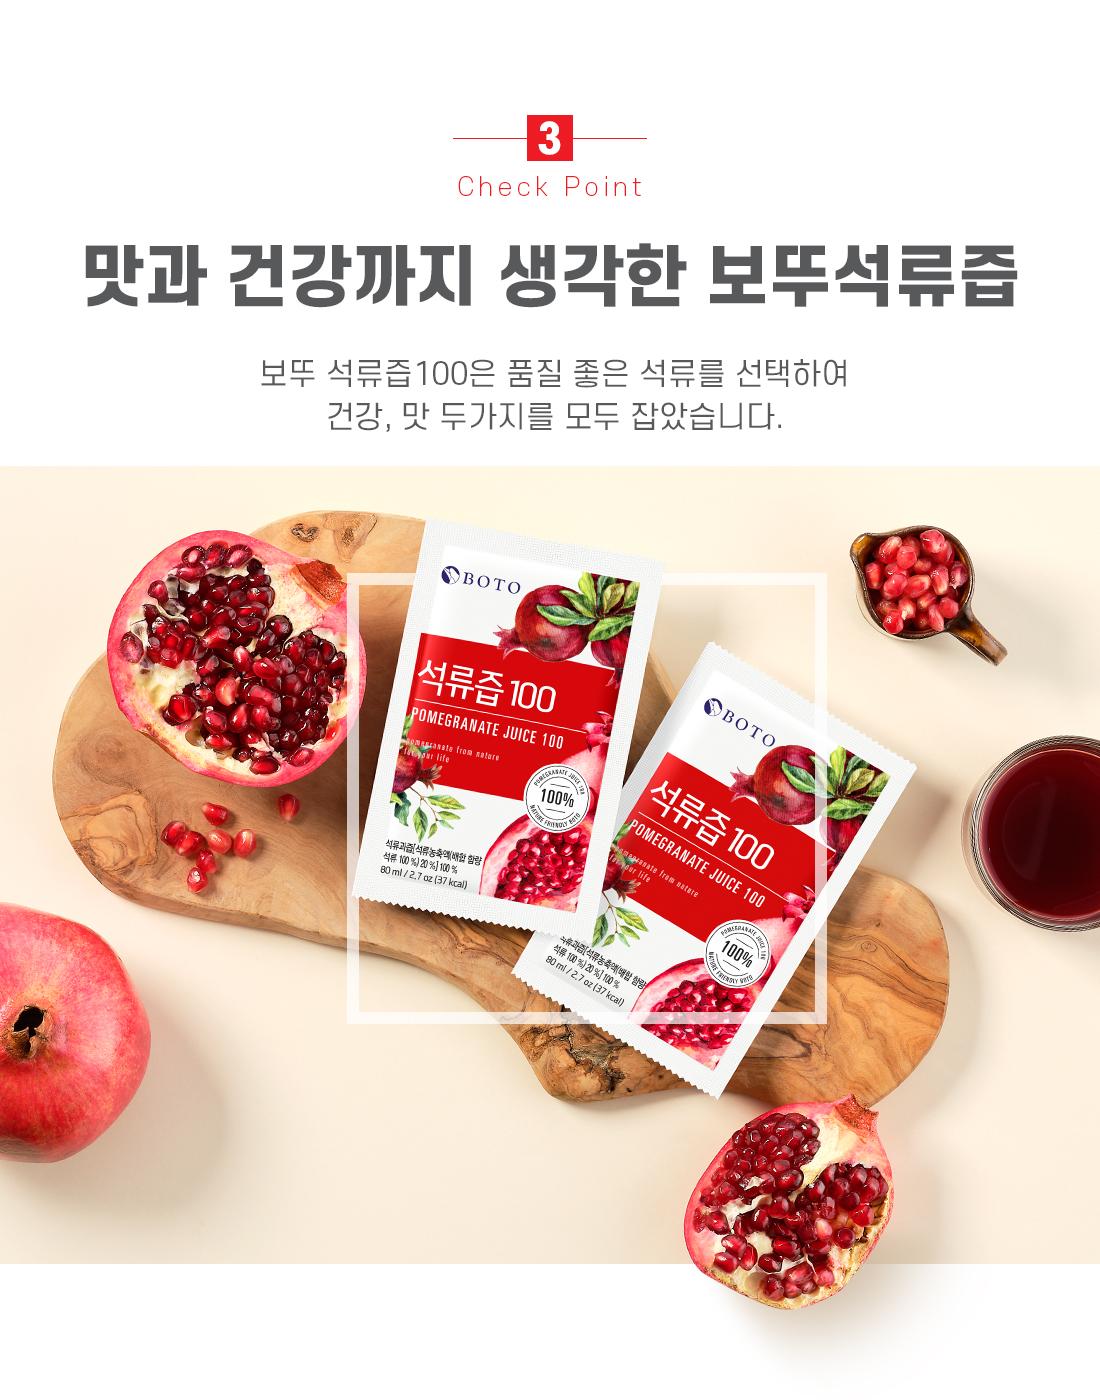 pomerante-juice-05-1-.jpg